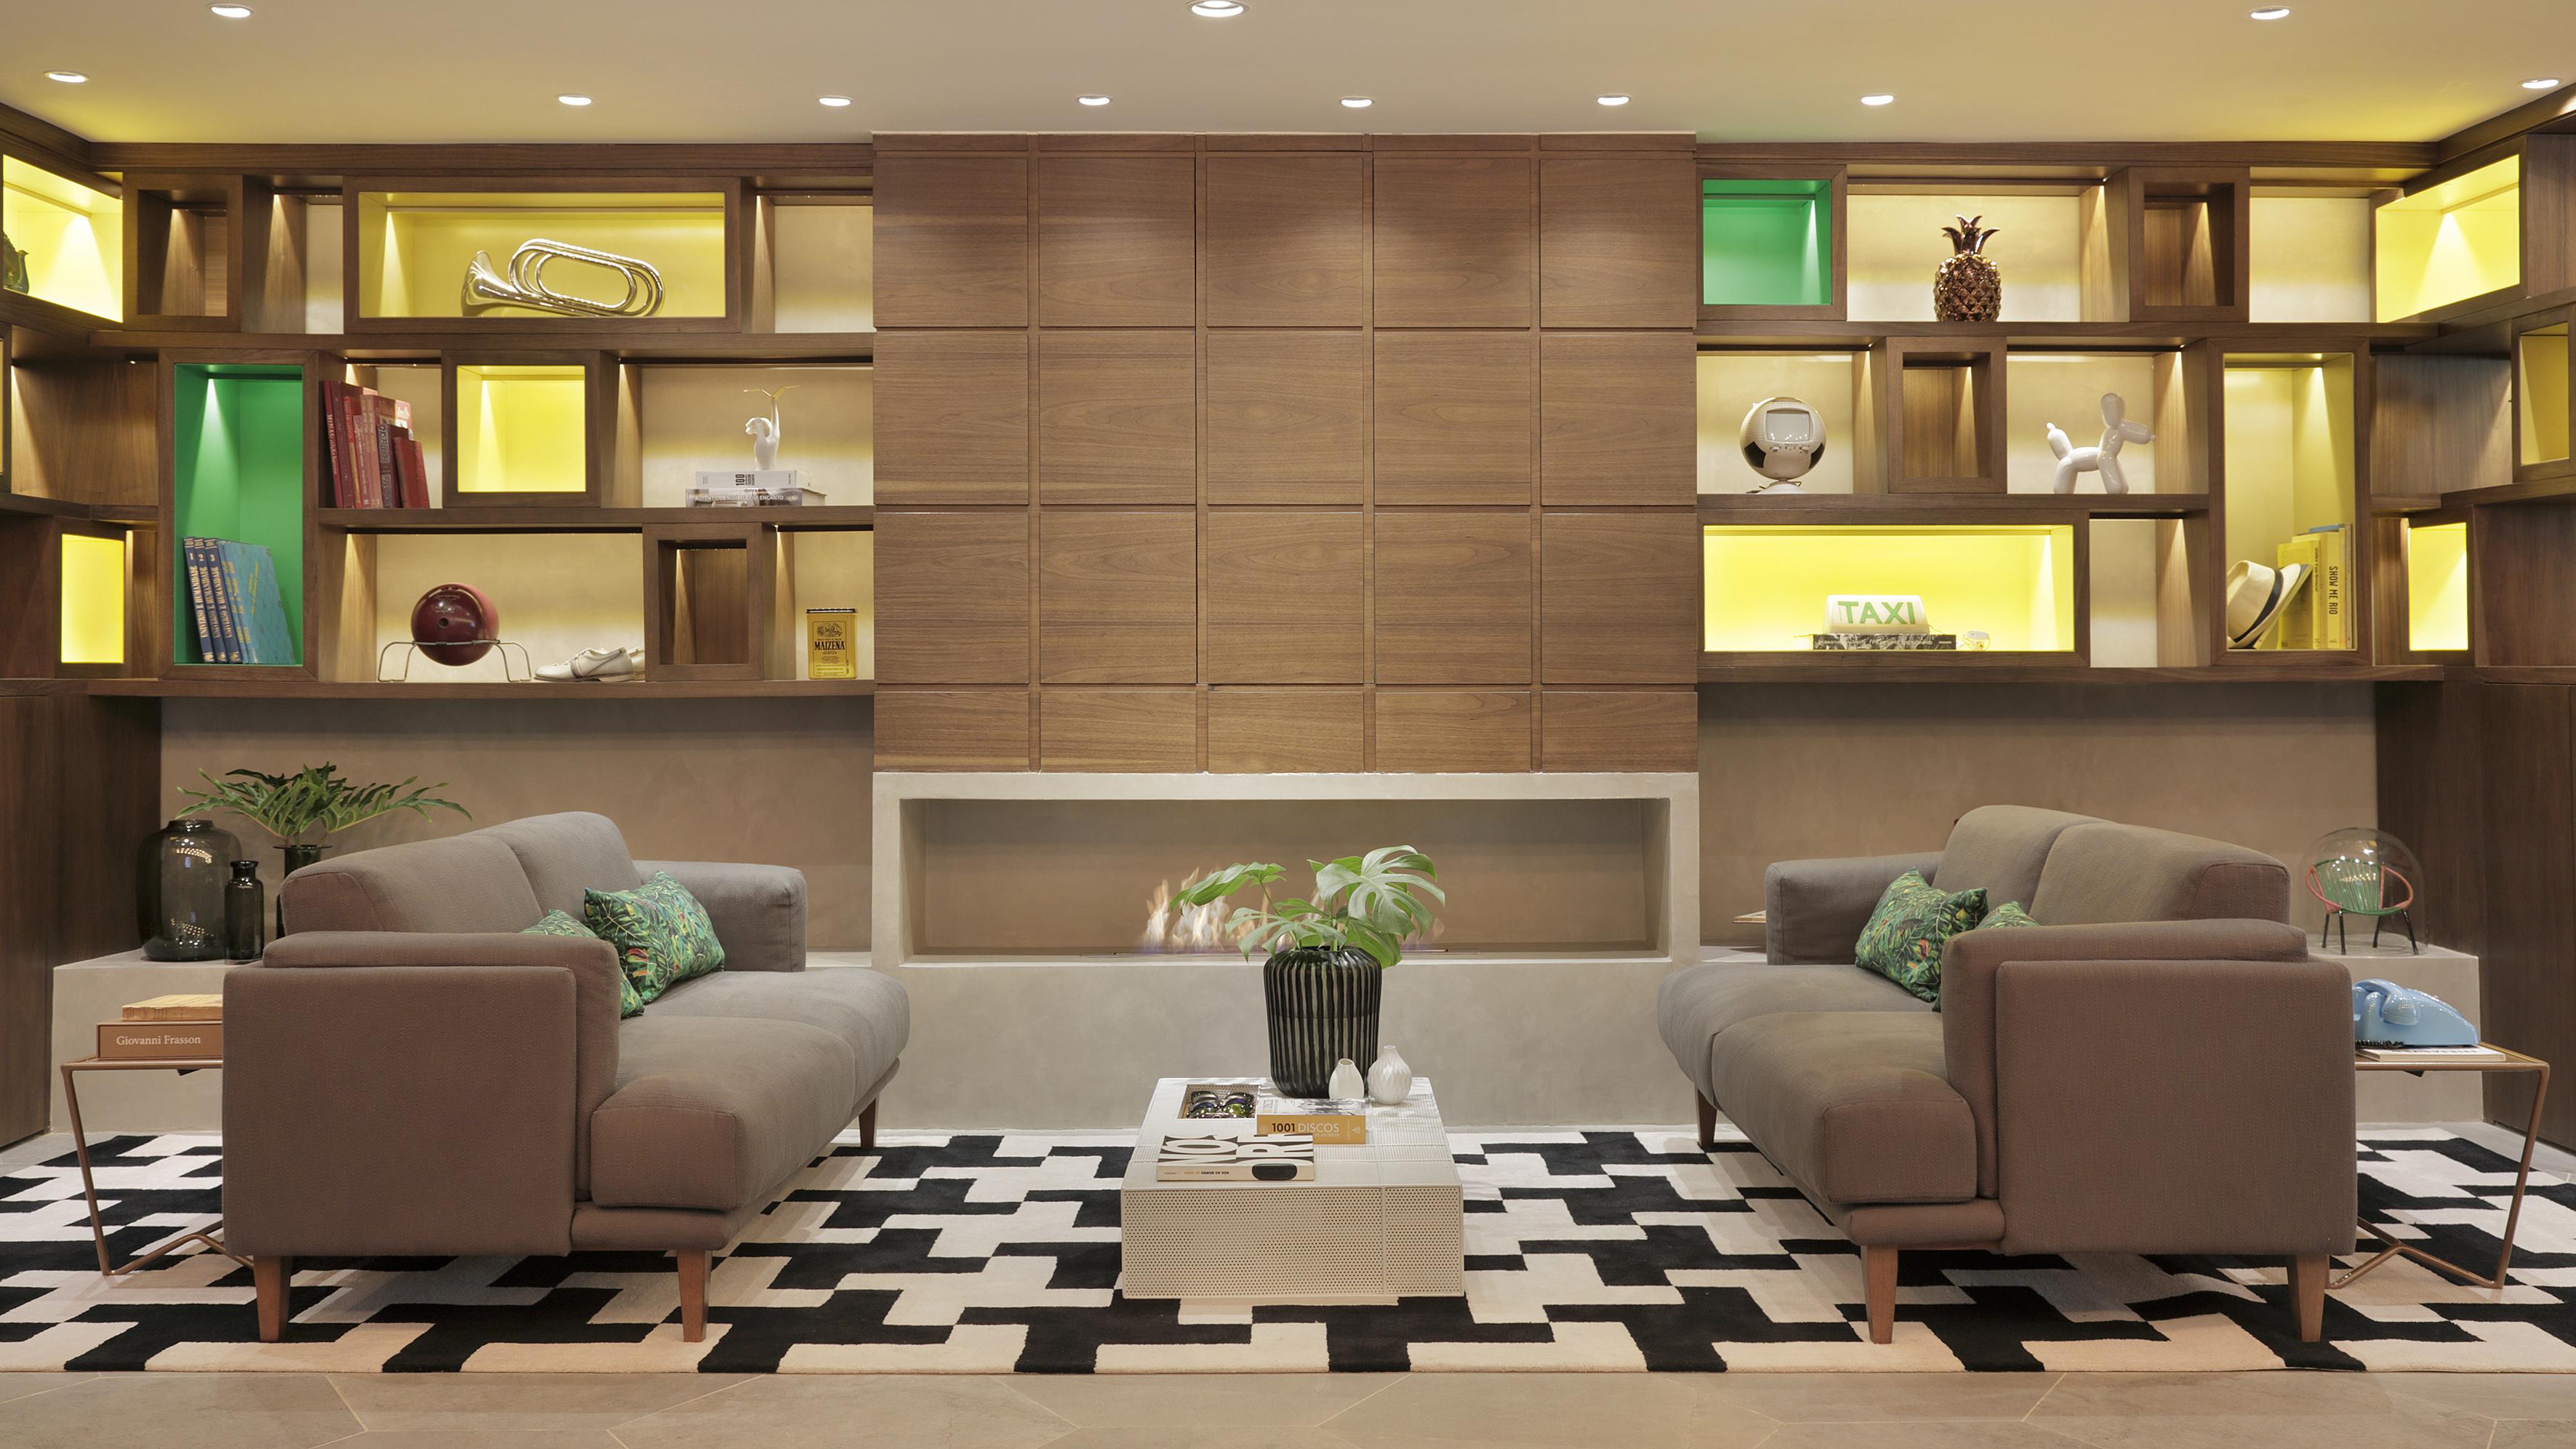 senior interior designer interior architect at yoo in london uk